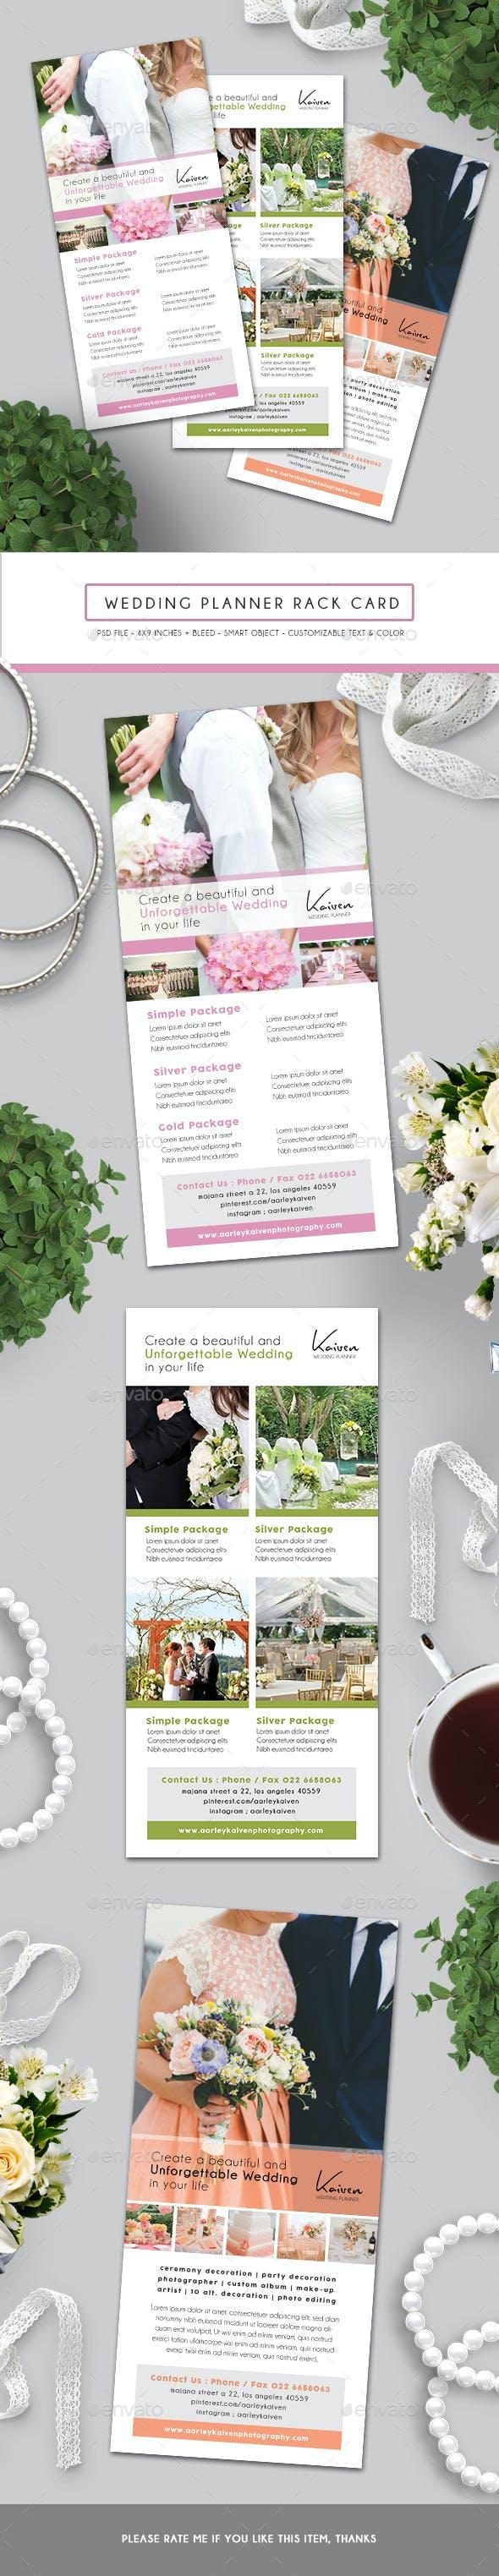 wedding planner rack card by arifpoernomo graphicriver